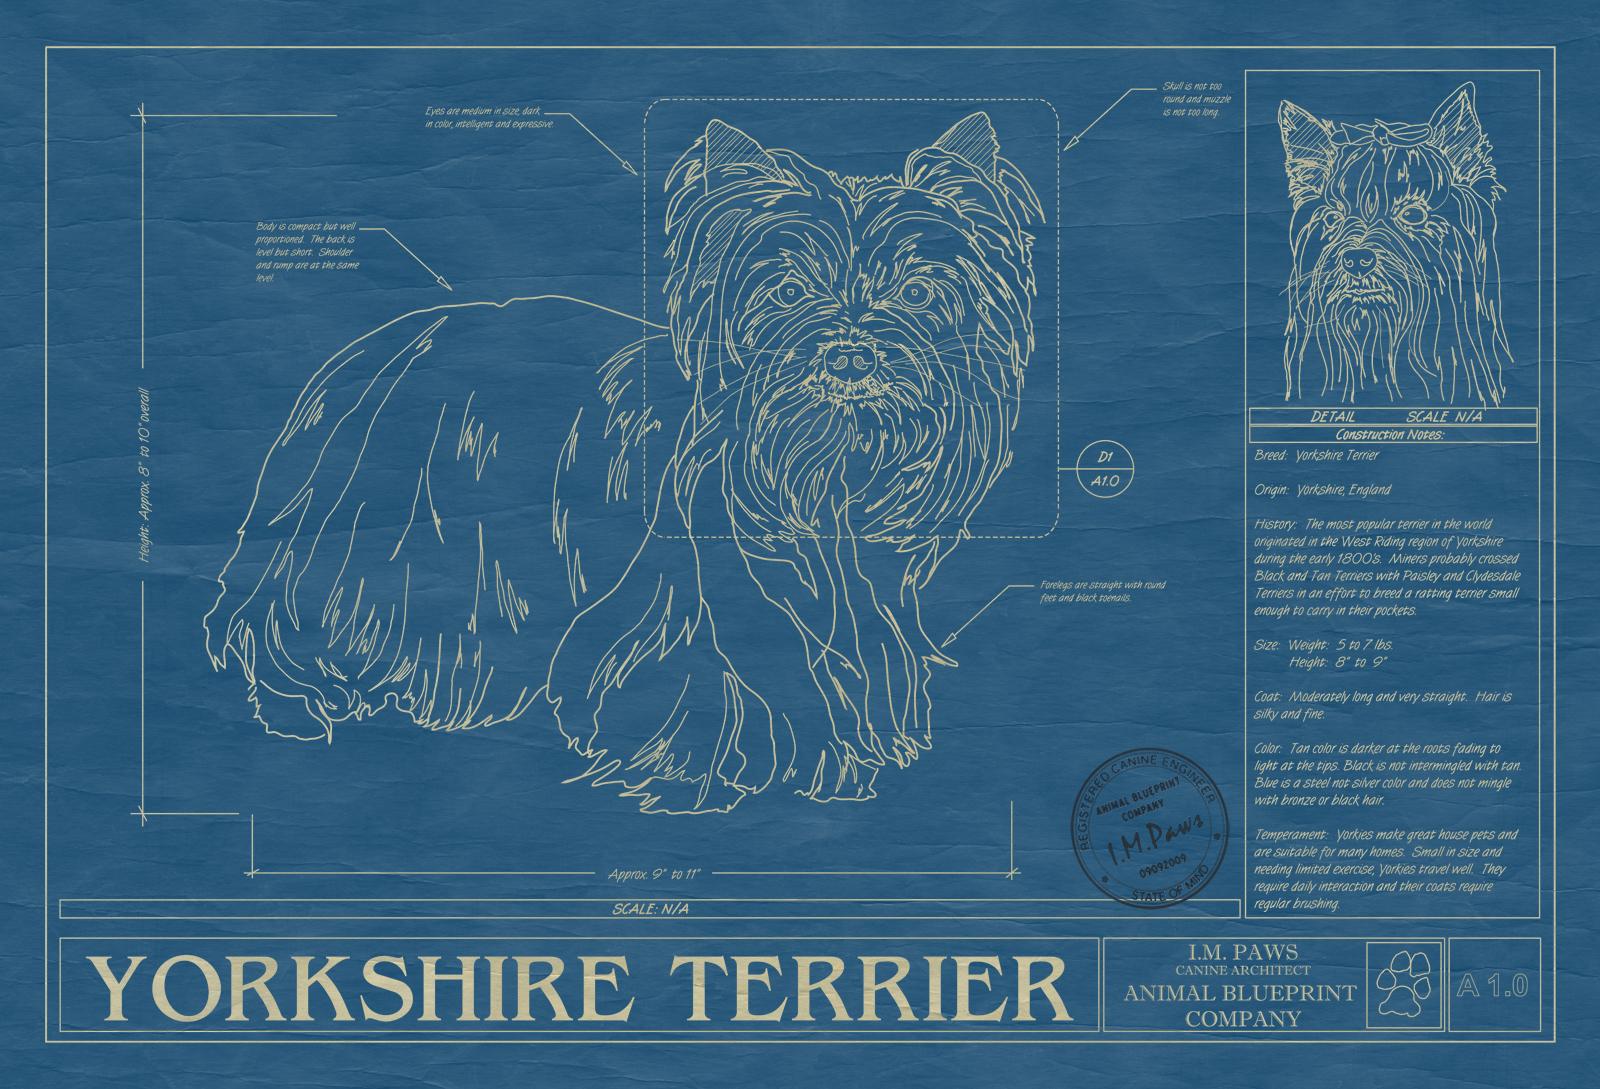 Yorkshire terrier animal blueprint company yorkshire terrier dog blueprint malvernweather Choice Image